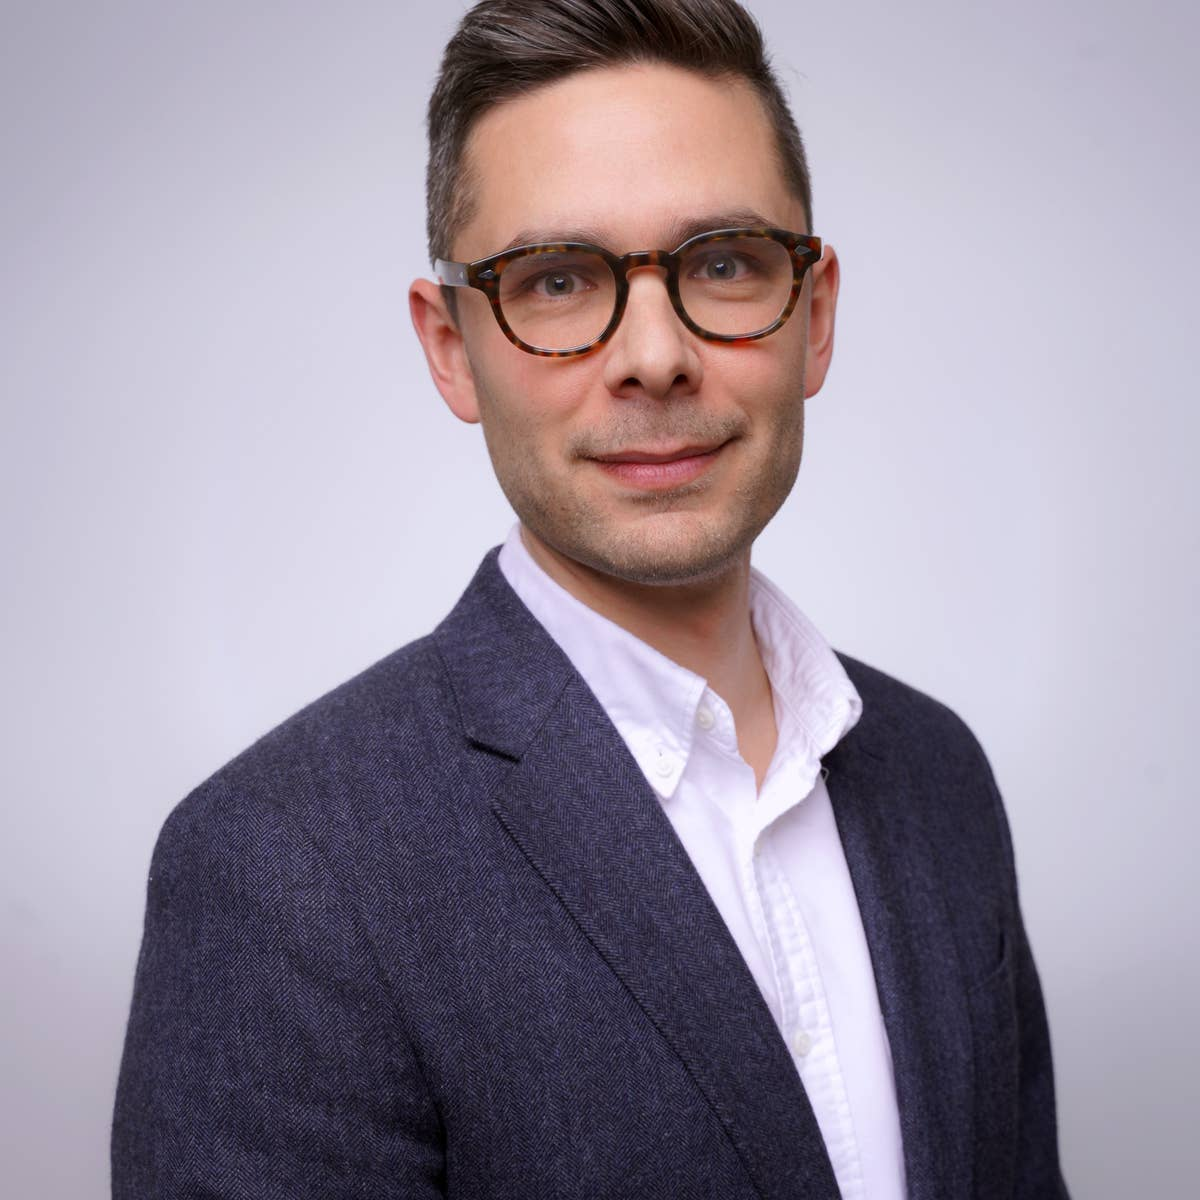 Carat hires Oliver Carthy as Head of Digital